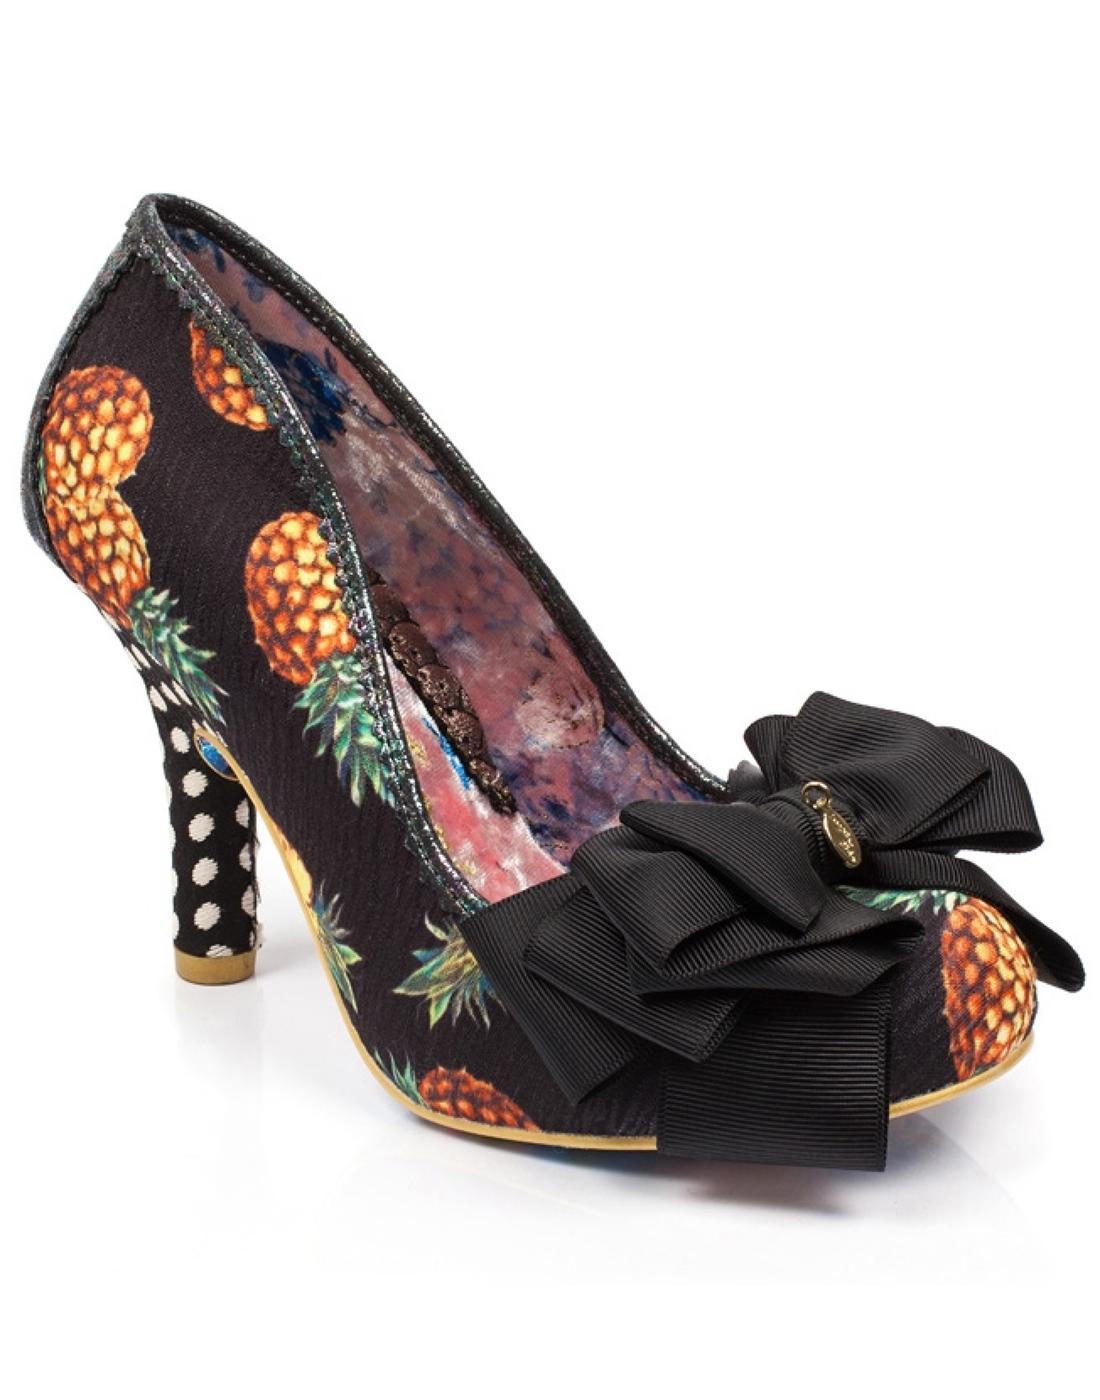 Ascot IRREGULAR CHOICE Black Pineapple Print Heel